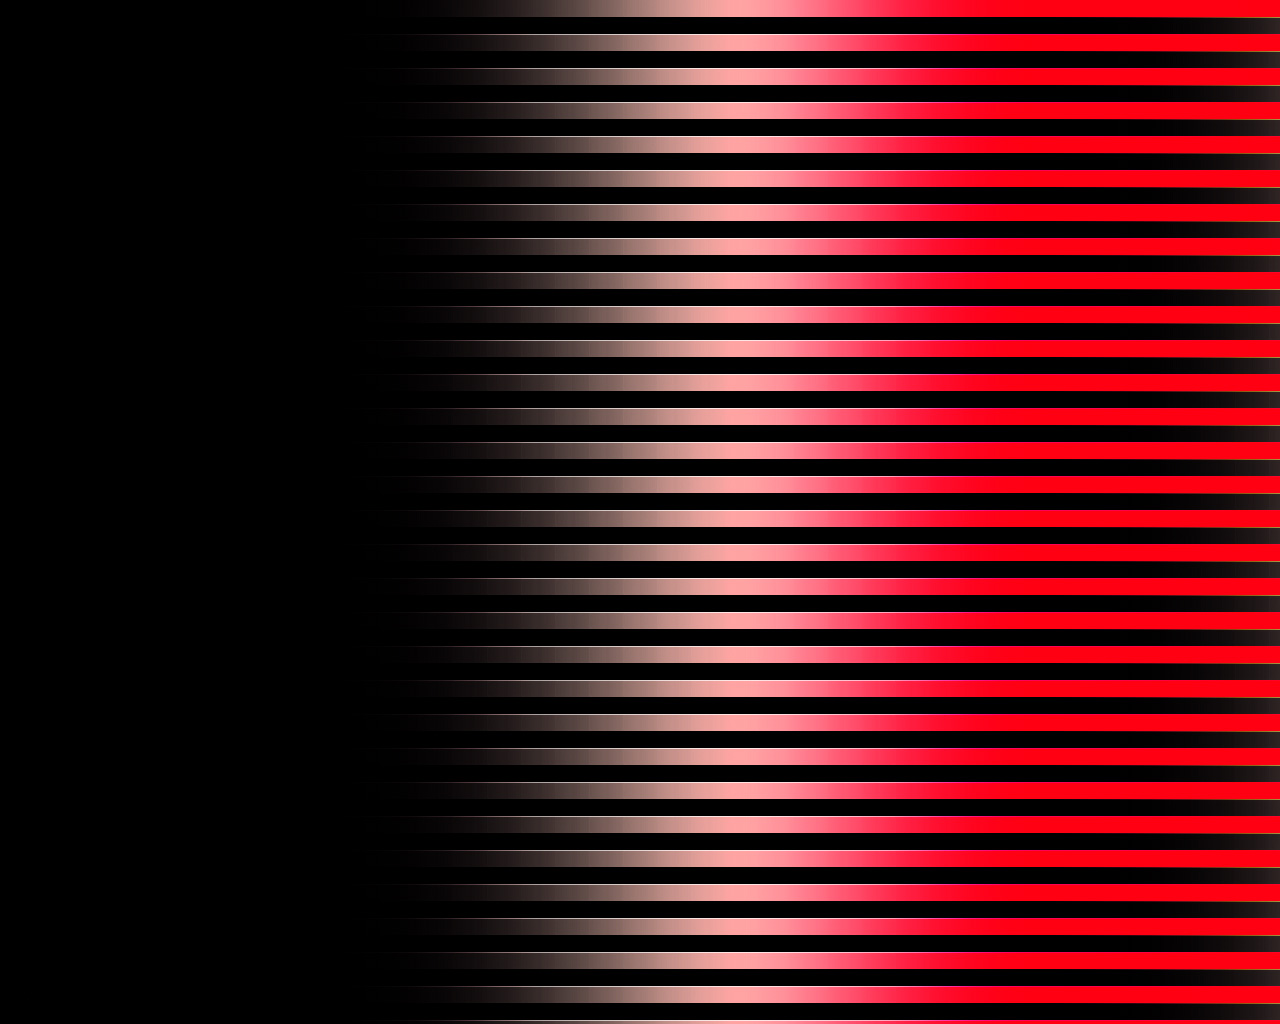 Free Download Sh Yn Design Stripe Pattern Wallpaper Red To Pink